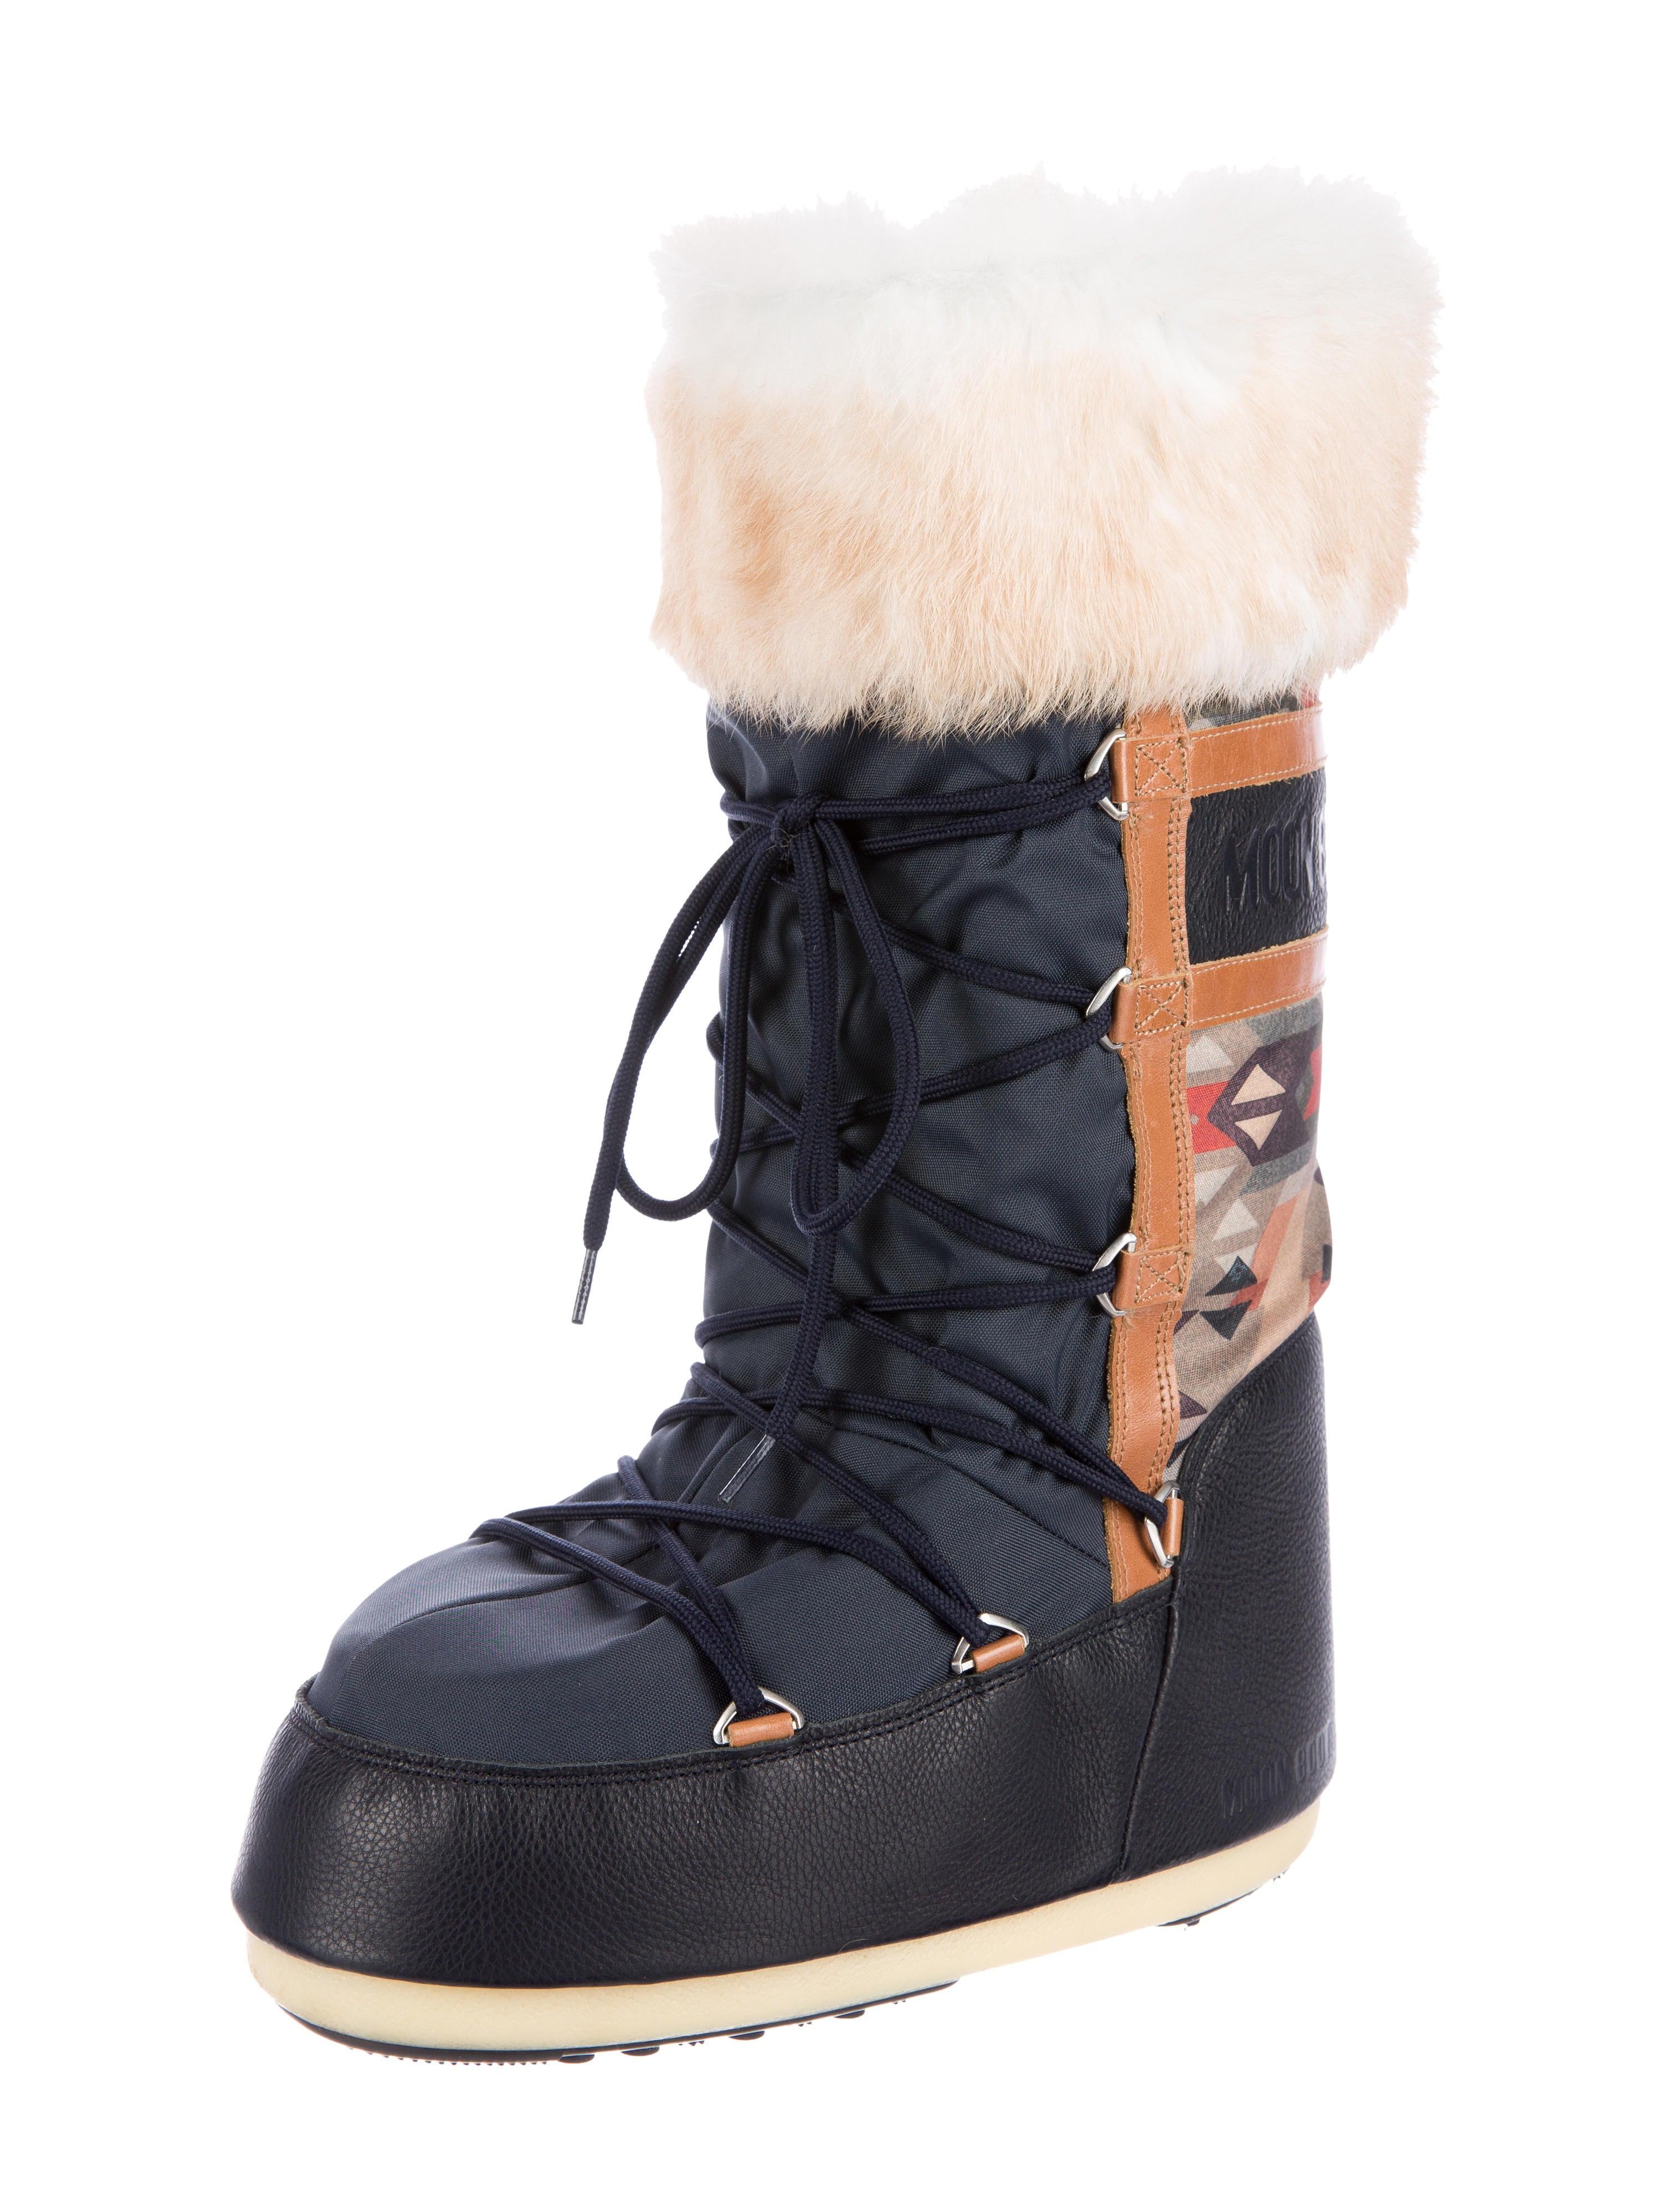 tecnica fur trimmed moon boots shoes wtecn20005 the. Black Bedroom Furniture Sets. Home Design Ideas